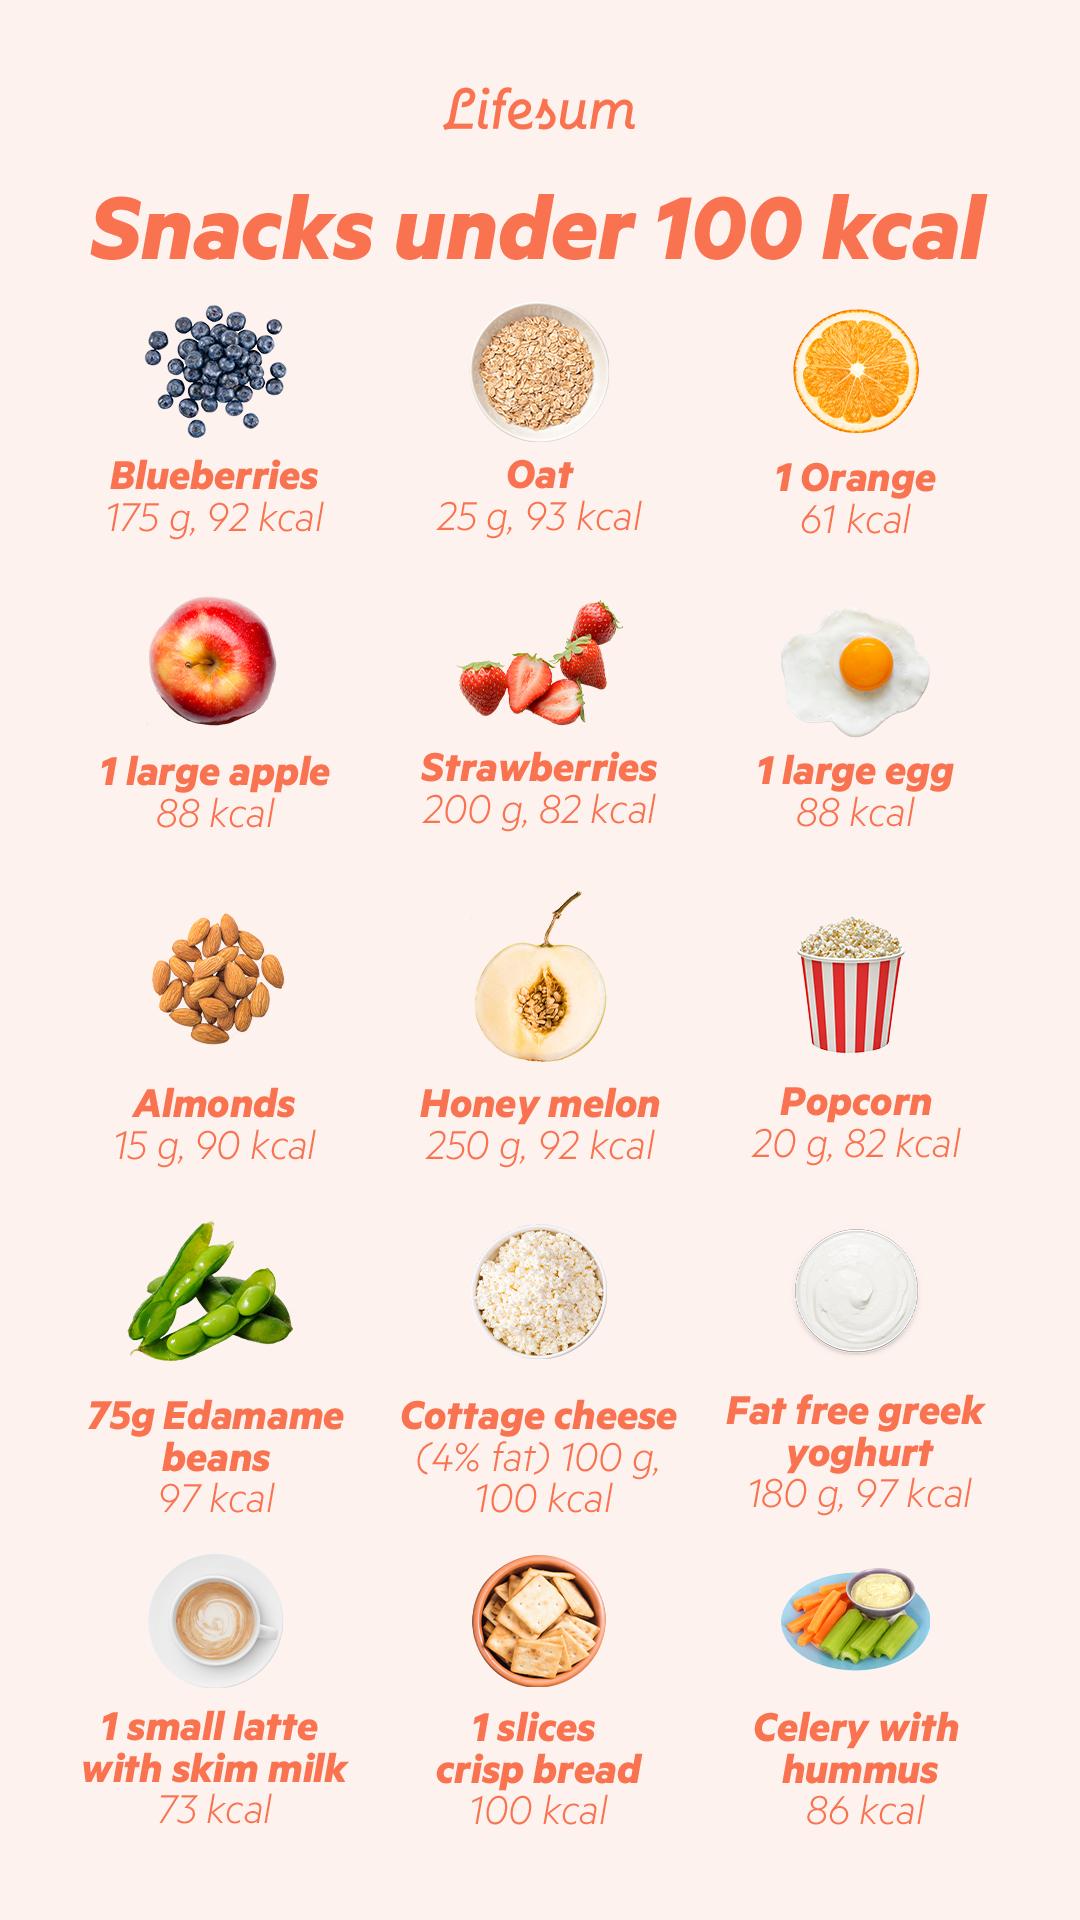 Snacks under 100 kcal